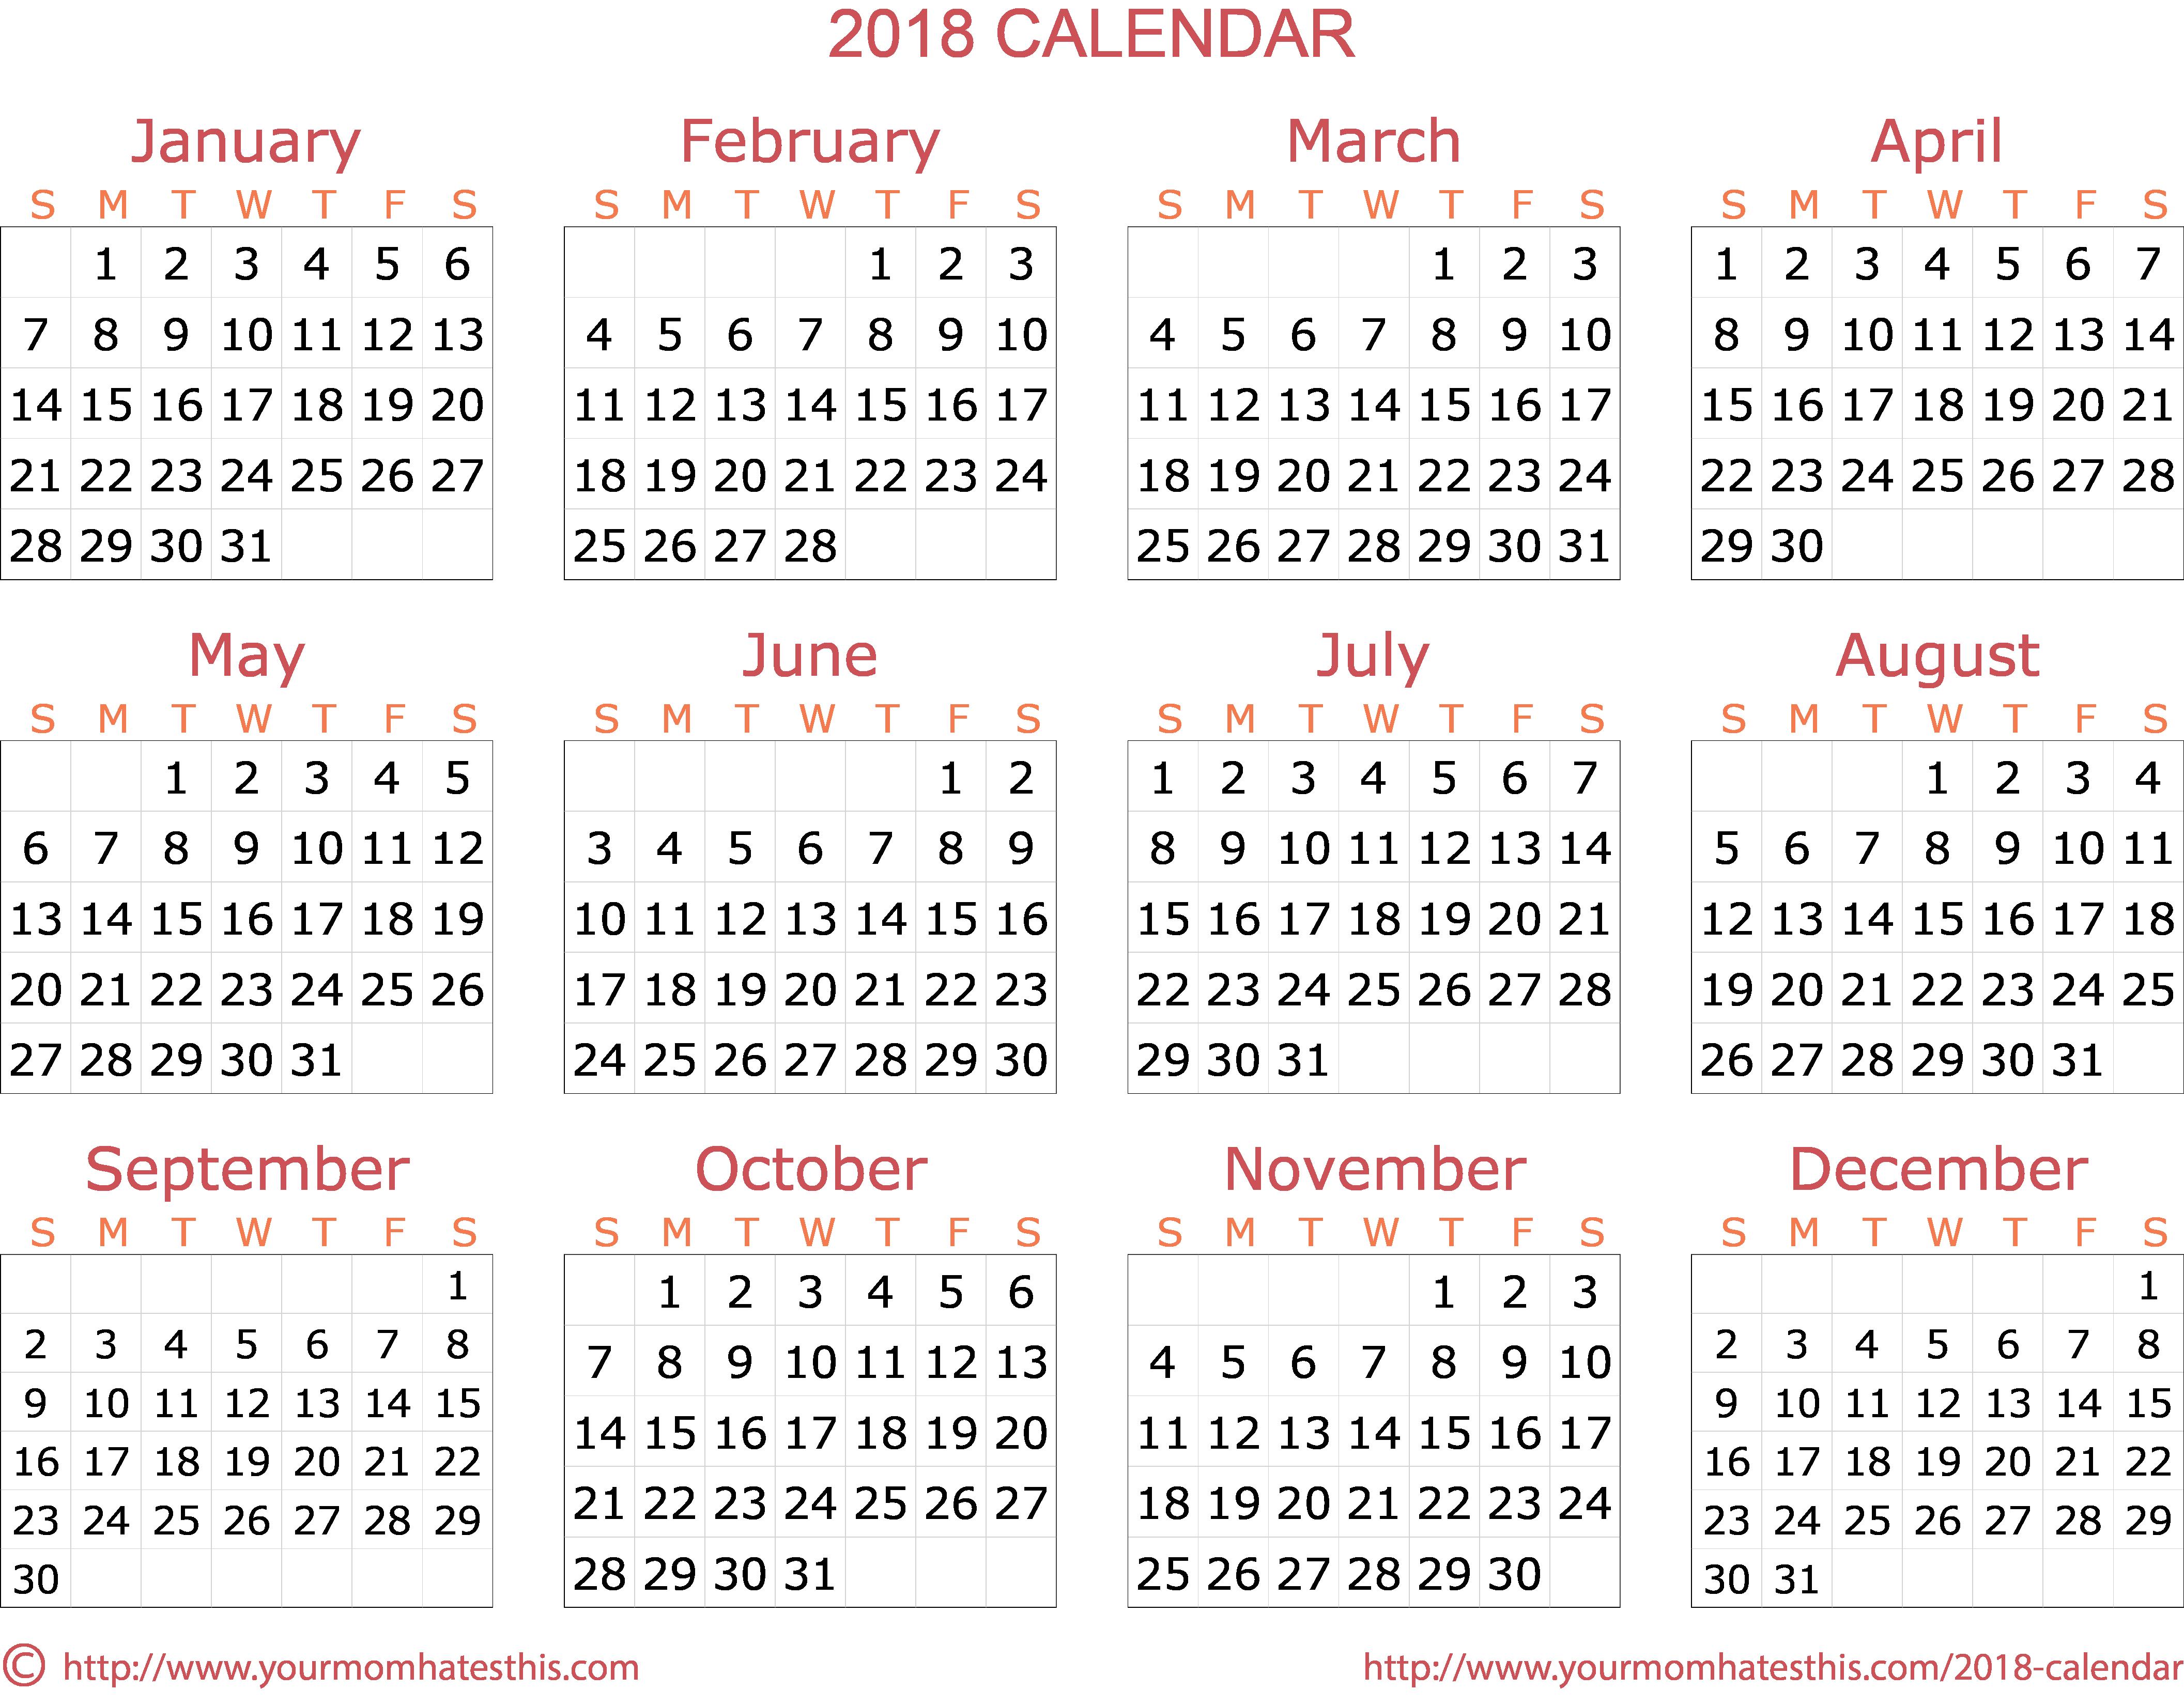 2018 Year Calendar Formal Template - PNG For Calendar